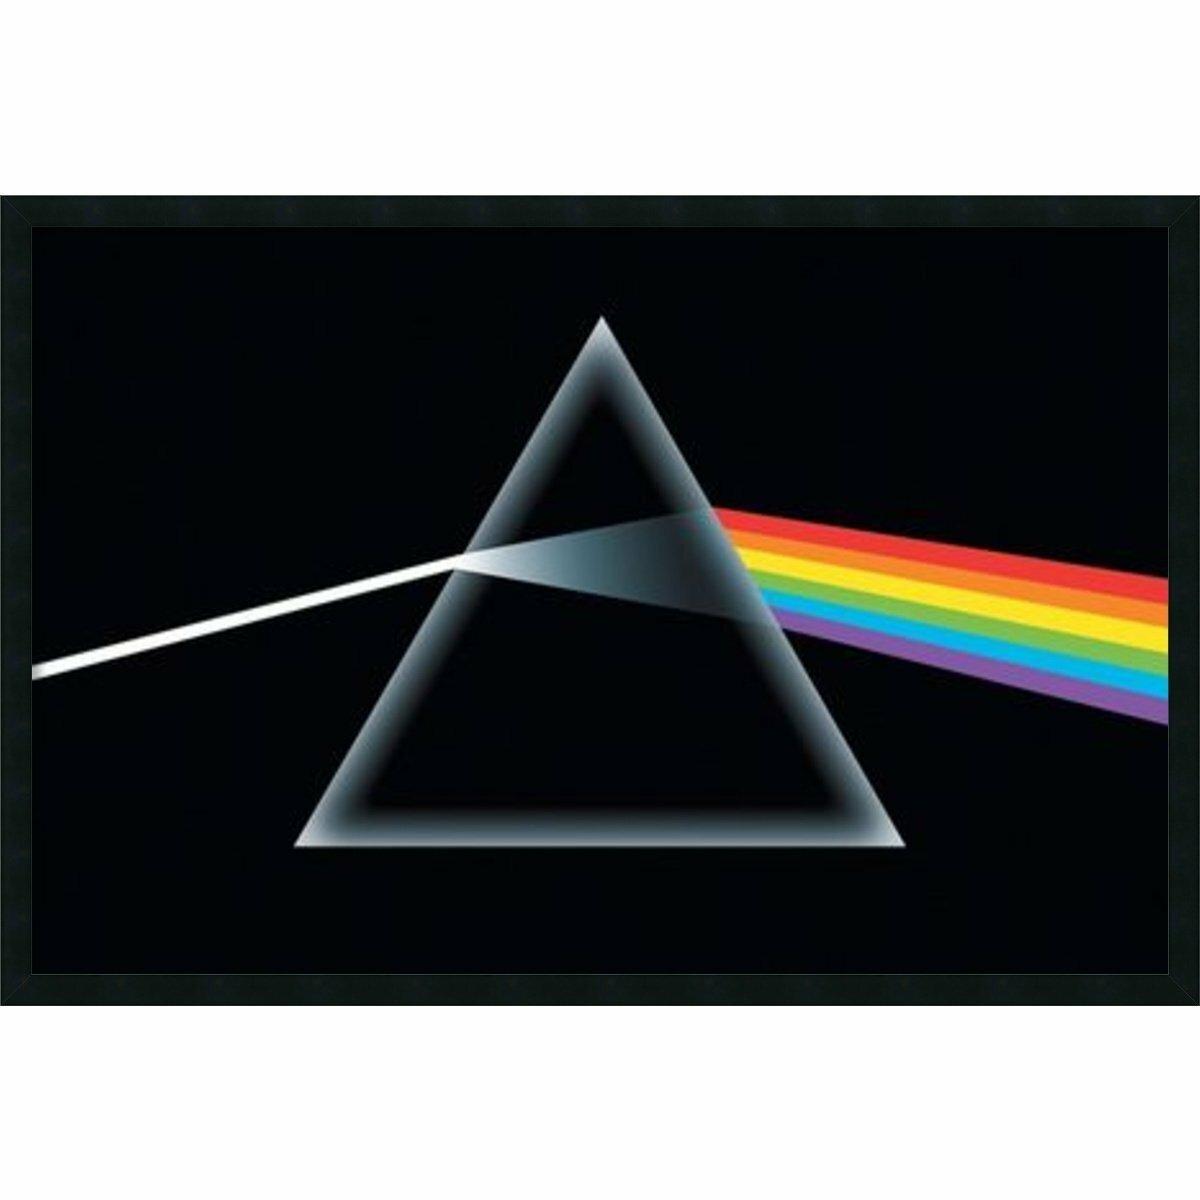 Buy Art For Less Pink Floyd Dark Side Of The Moon Prism Framed